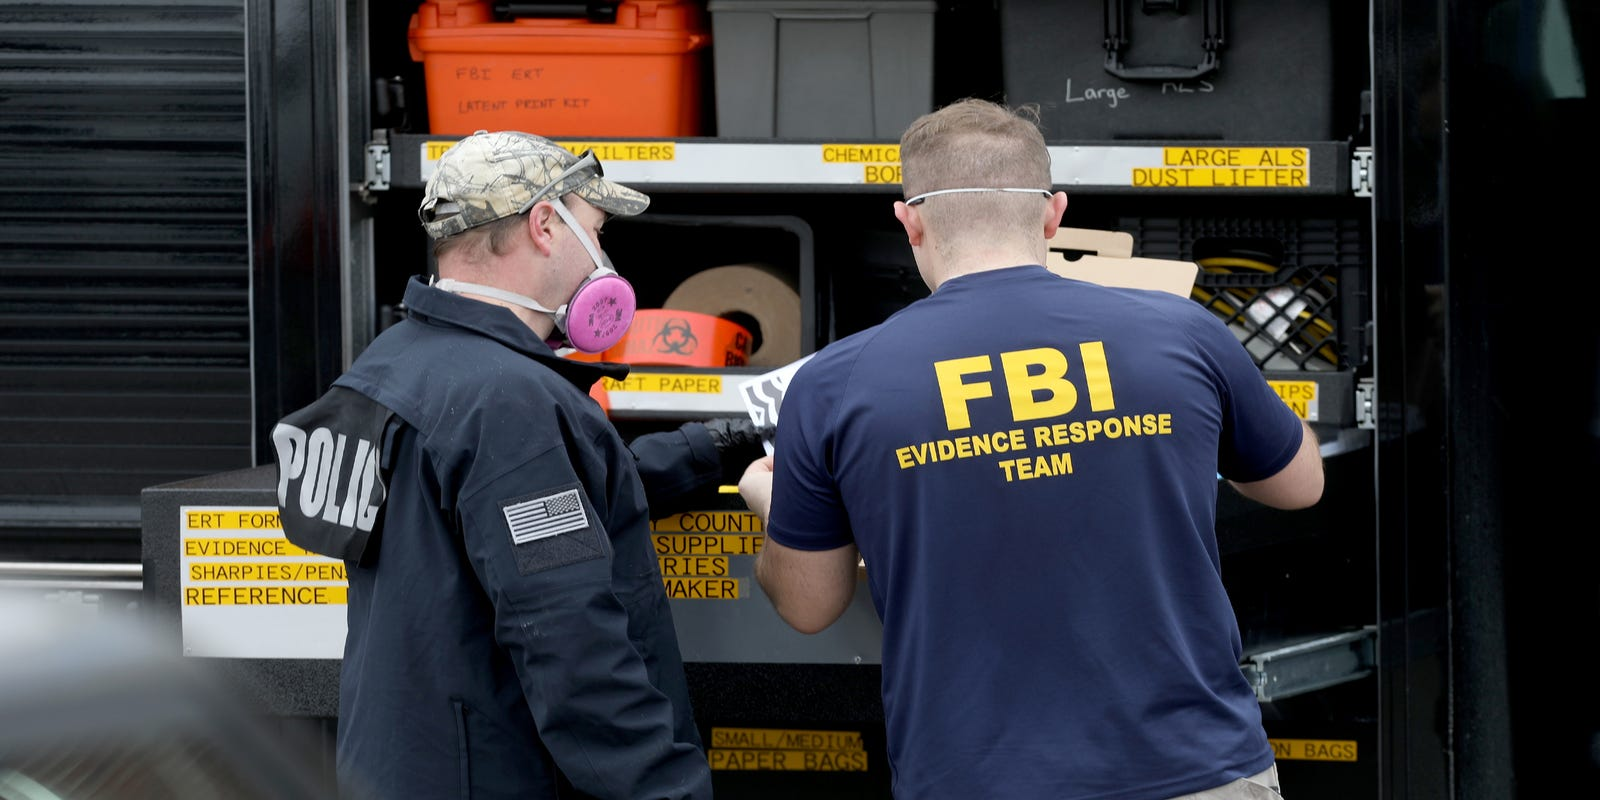 Fbi Raids Allure Medical For Alleged Fraudulent Covid 19 Treatments